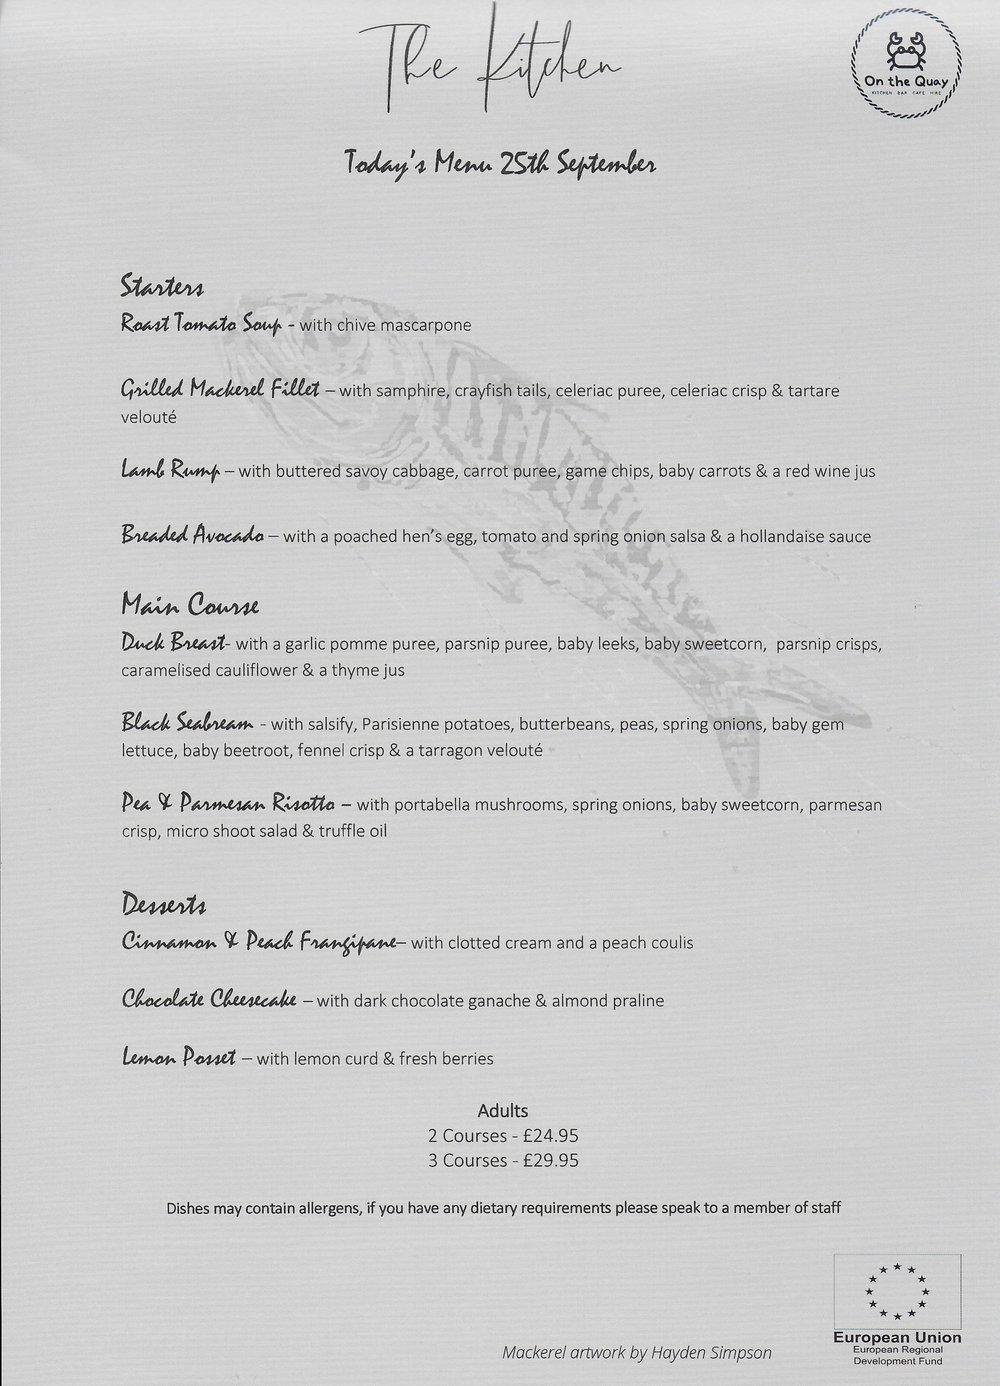 dinner menu 25-9-18.jpeg.jpeg